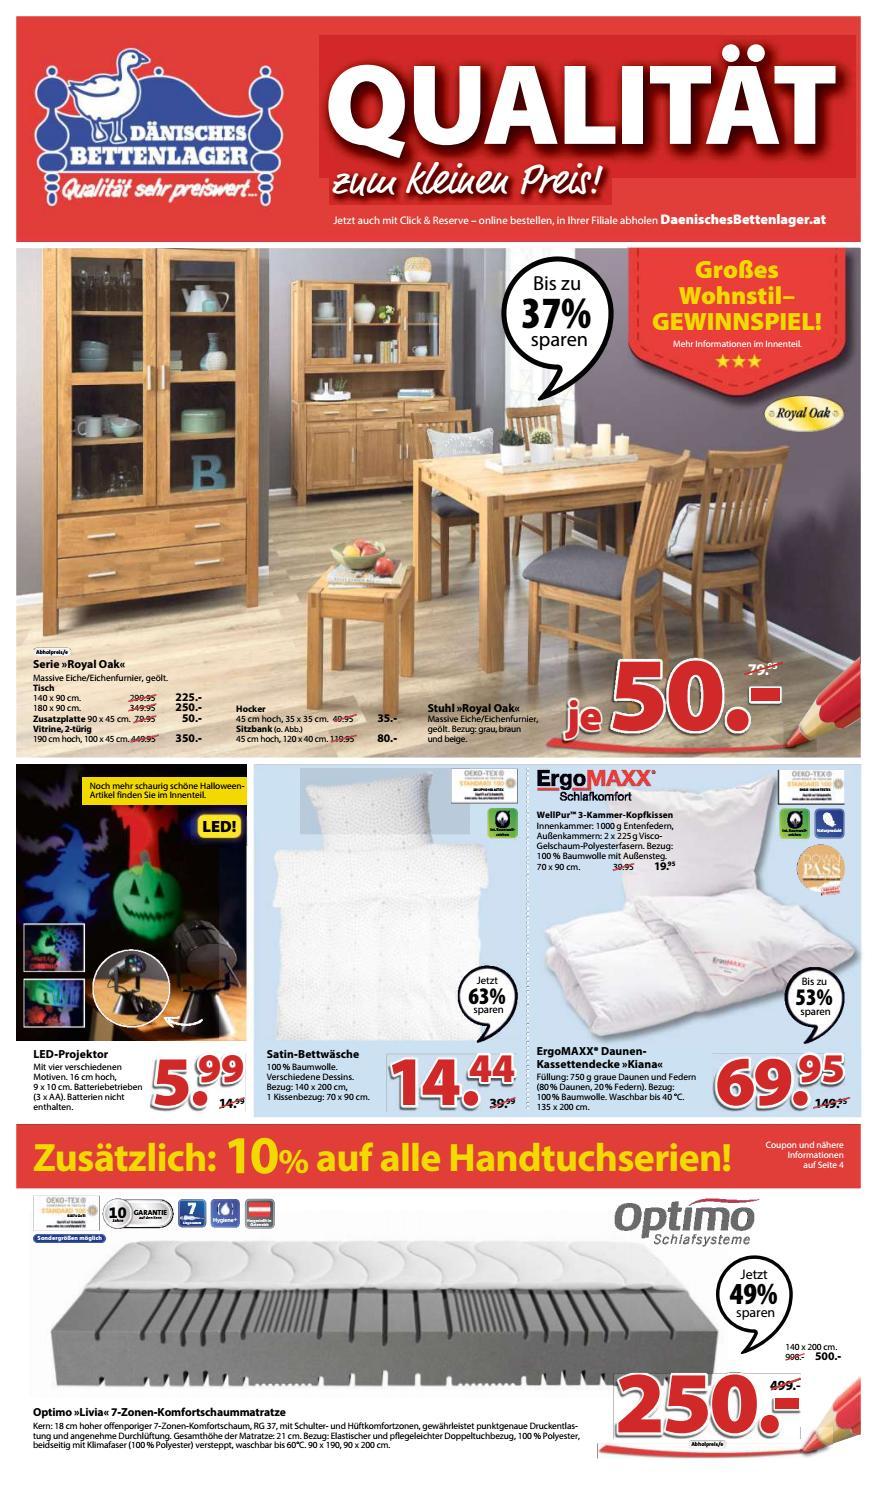 daenisches bettenlager kw41 by russmedia digital gmbh issuu. Black Bedroom Furniture Sets. Home Design Ideas